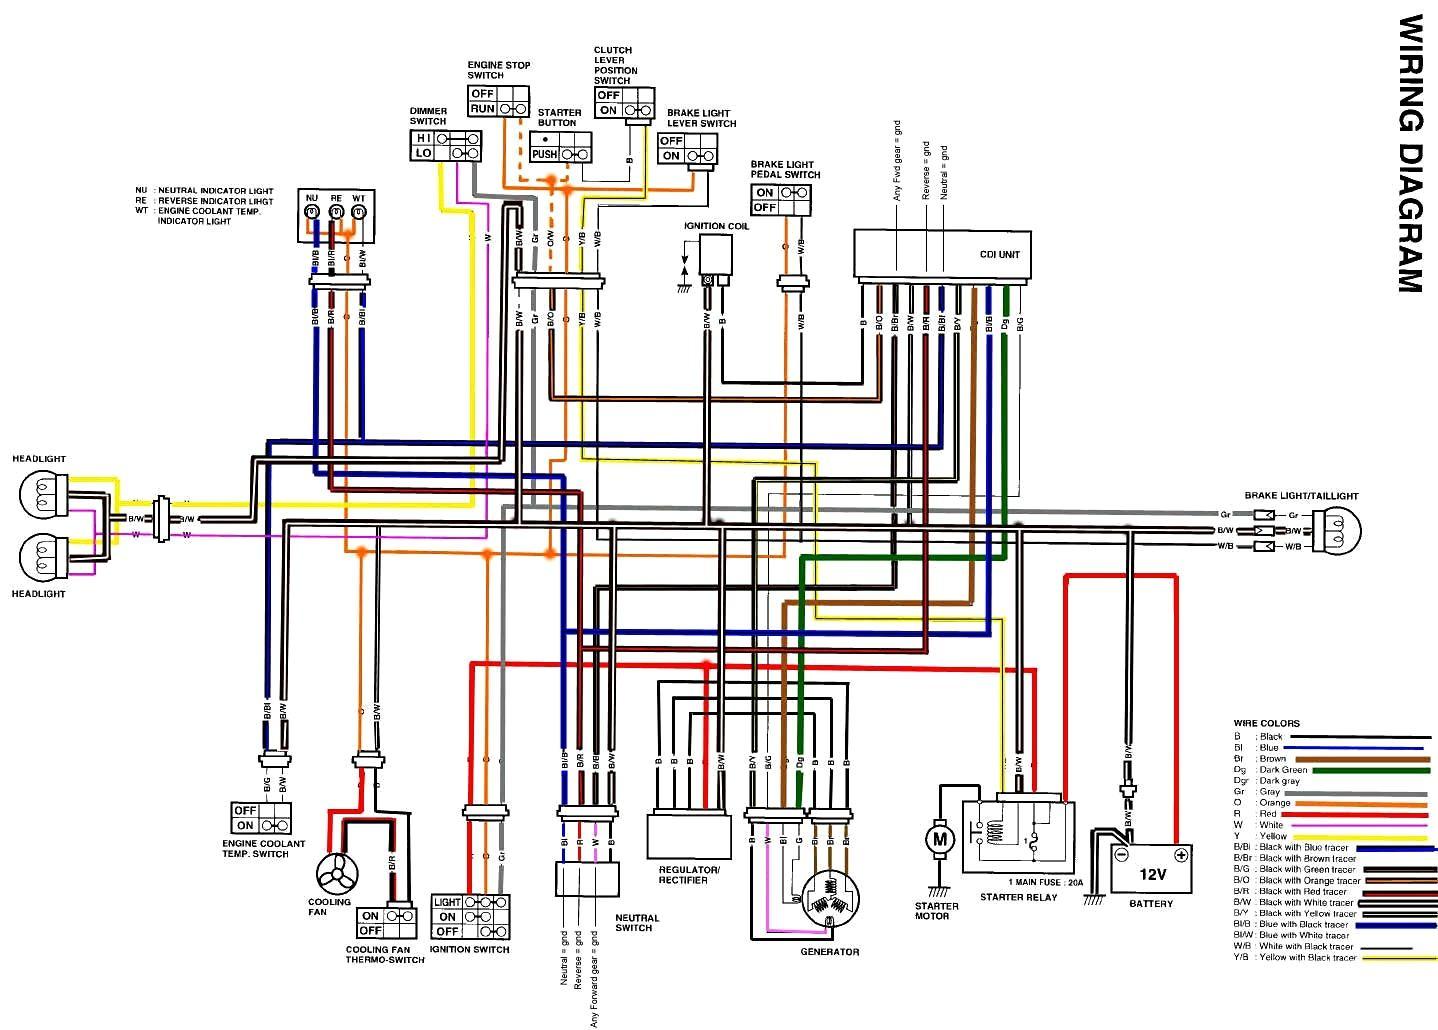 2006 Yfz 450 Wiring Diagram In Yamaha Yfz450 Forum Yfz450r Yfz450x Best Of Electrical Wiring Diagram Yamaha Electrical Diagram